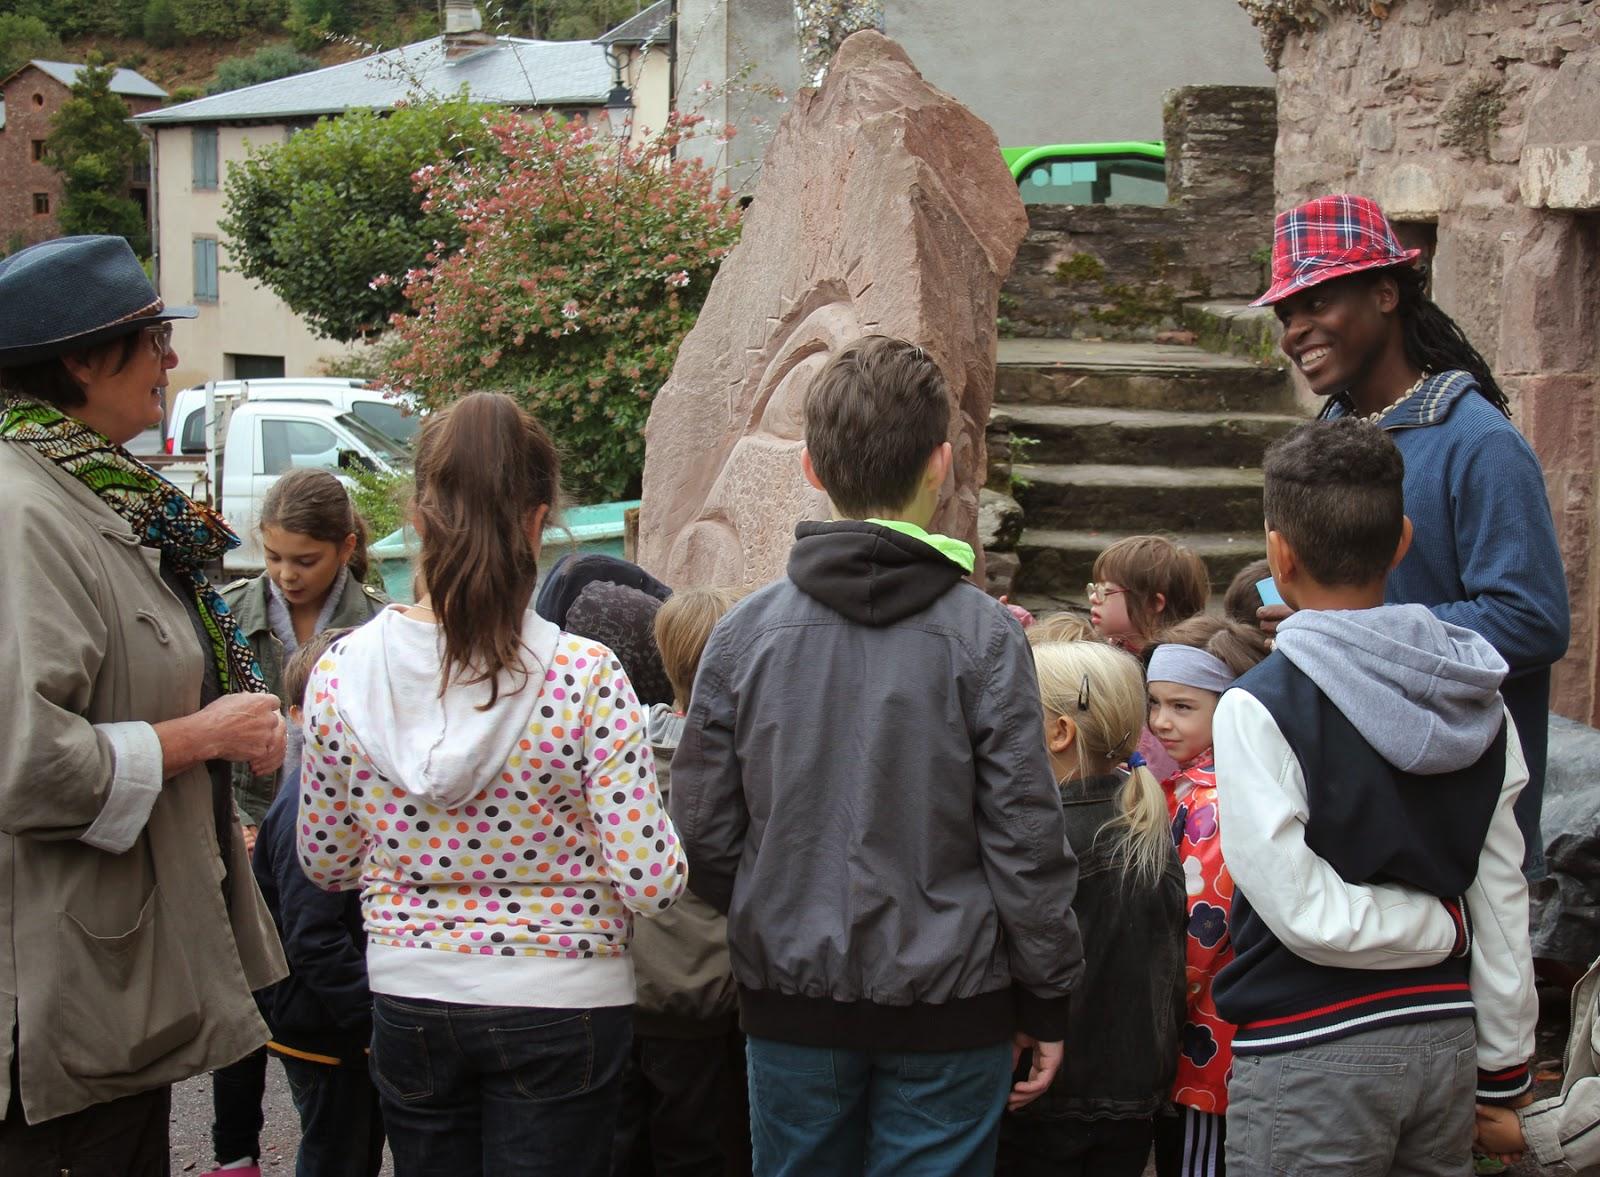 http://artsbuissonniers.blogspot.fr/p/blog-page_1.html